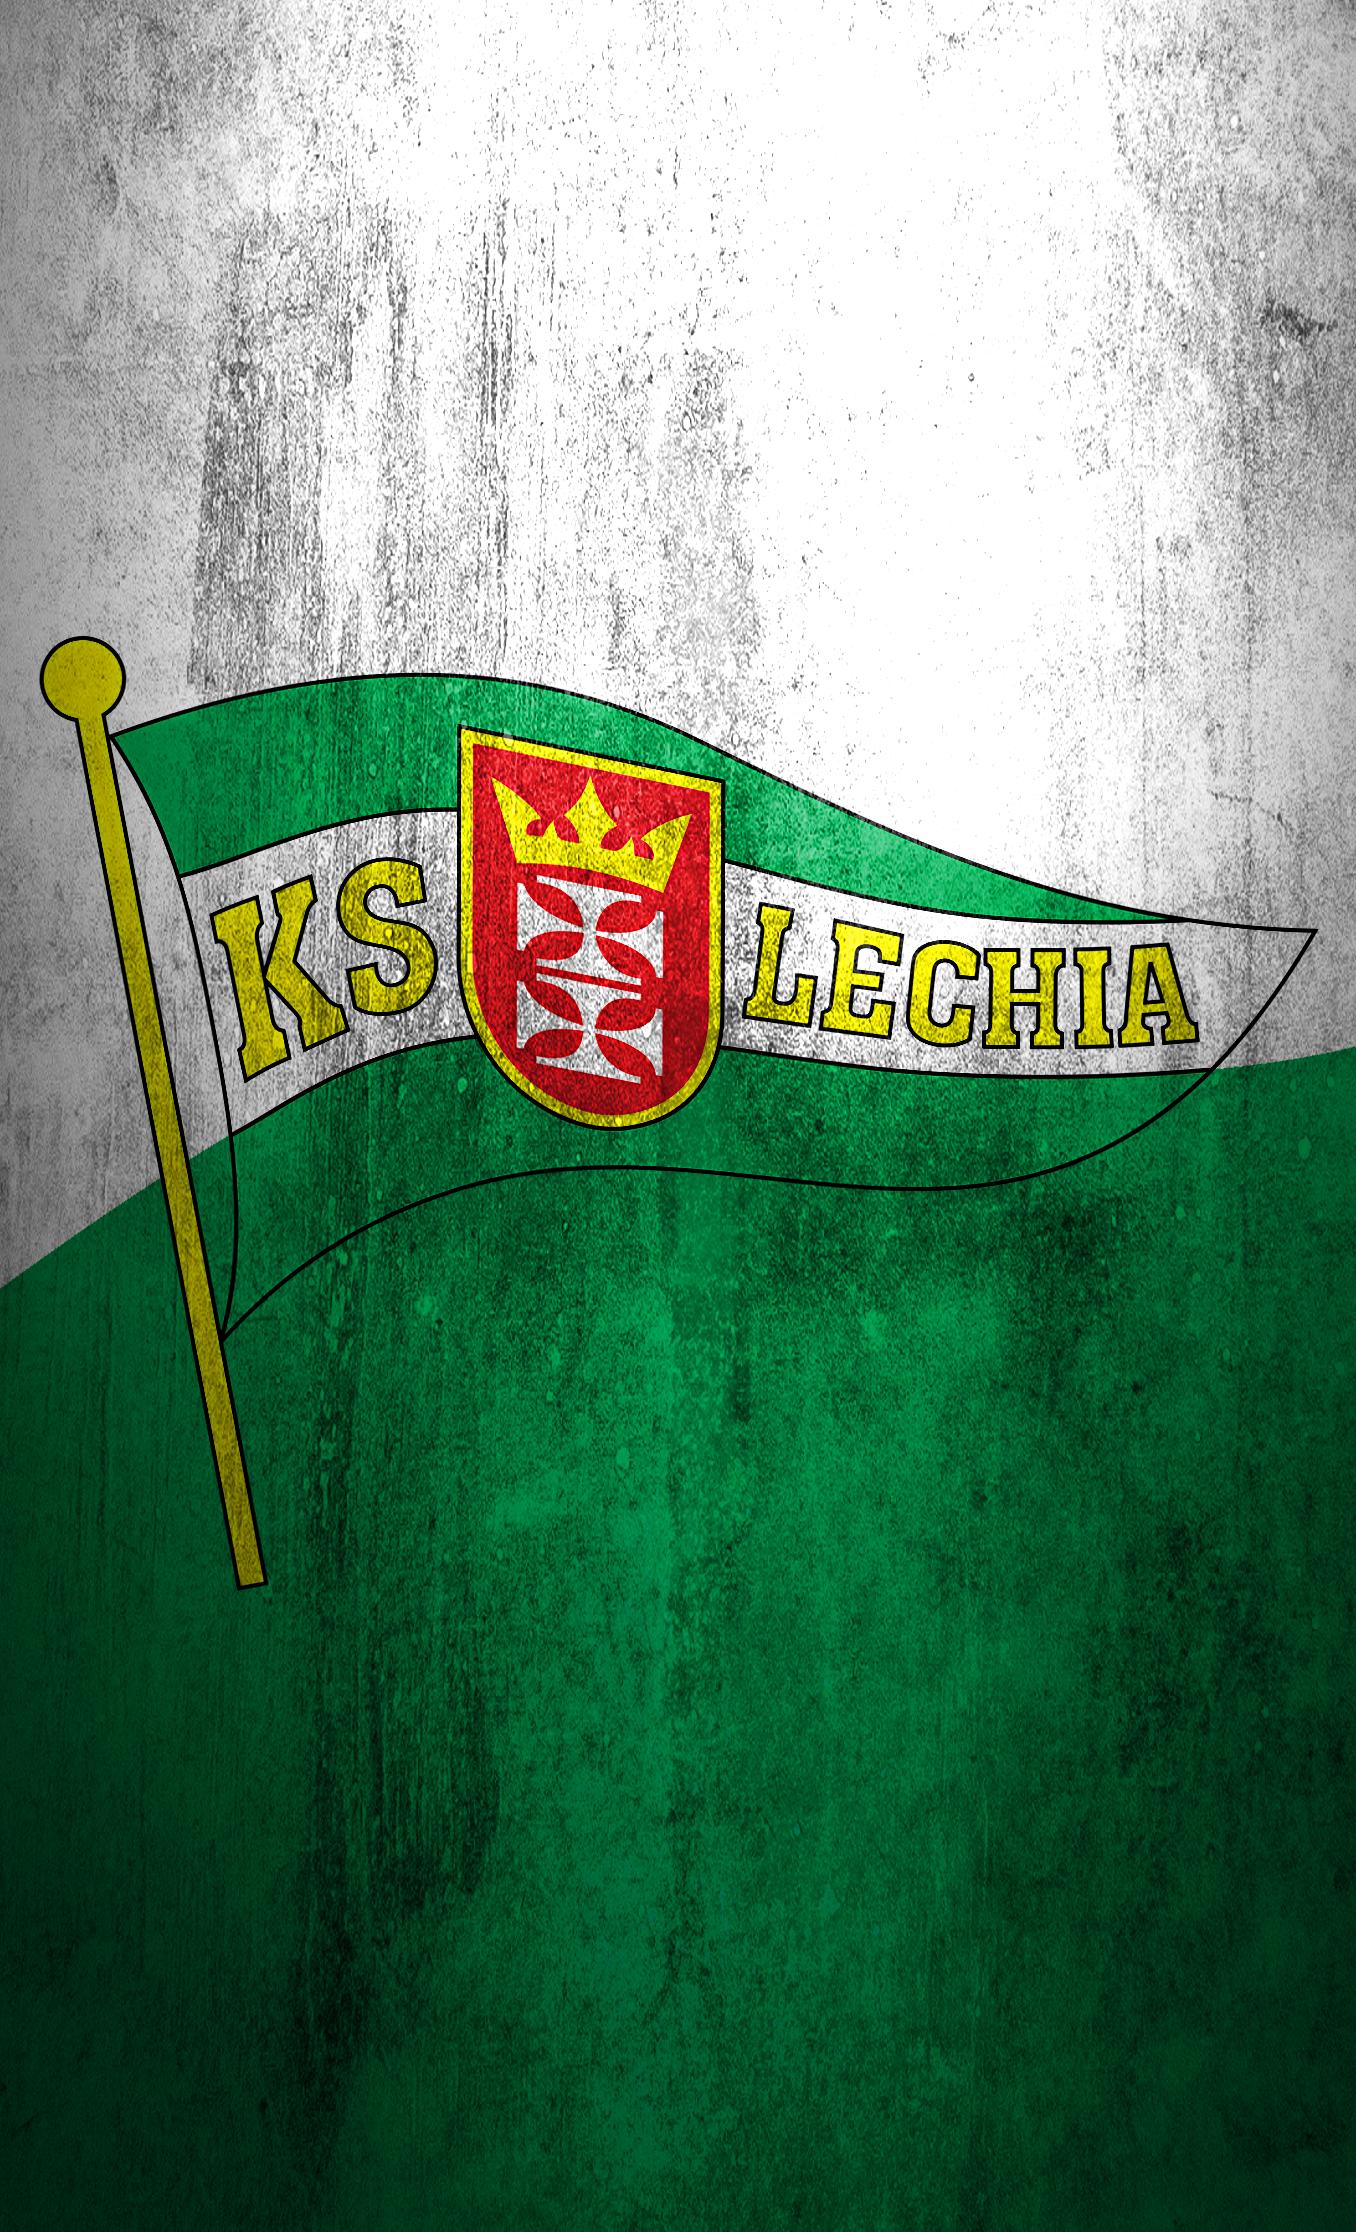 Lechia Gdansk logo mobile wallpaper by Adik1910 on DeviantArt